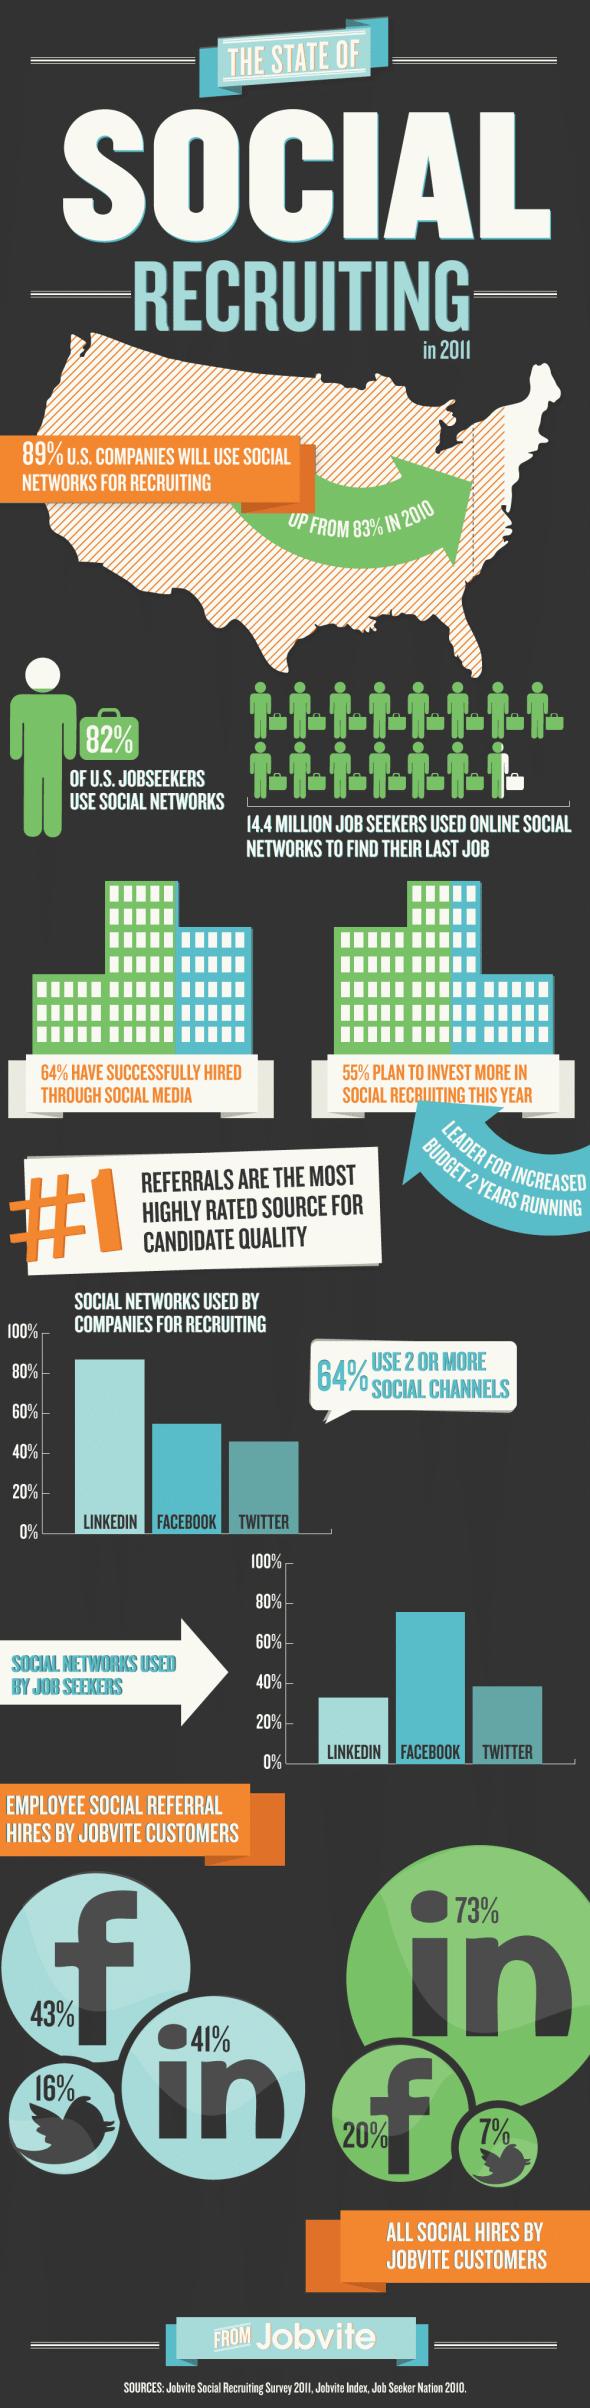 Social Recruiting Report 2011 - Infografik